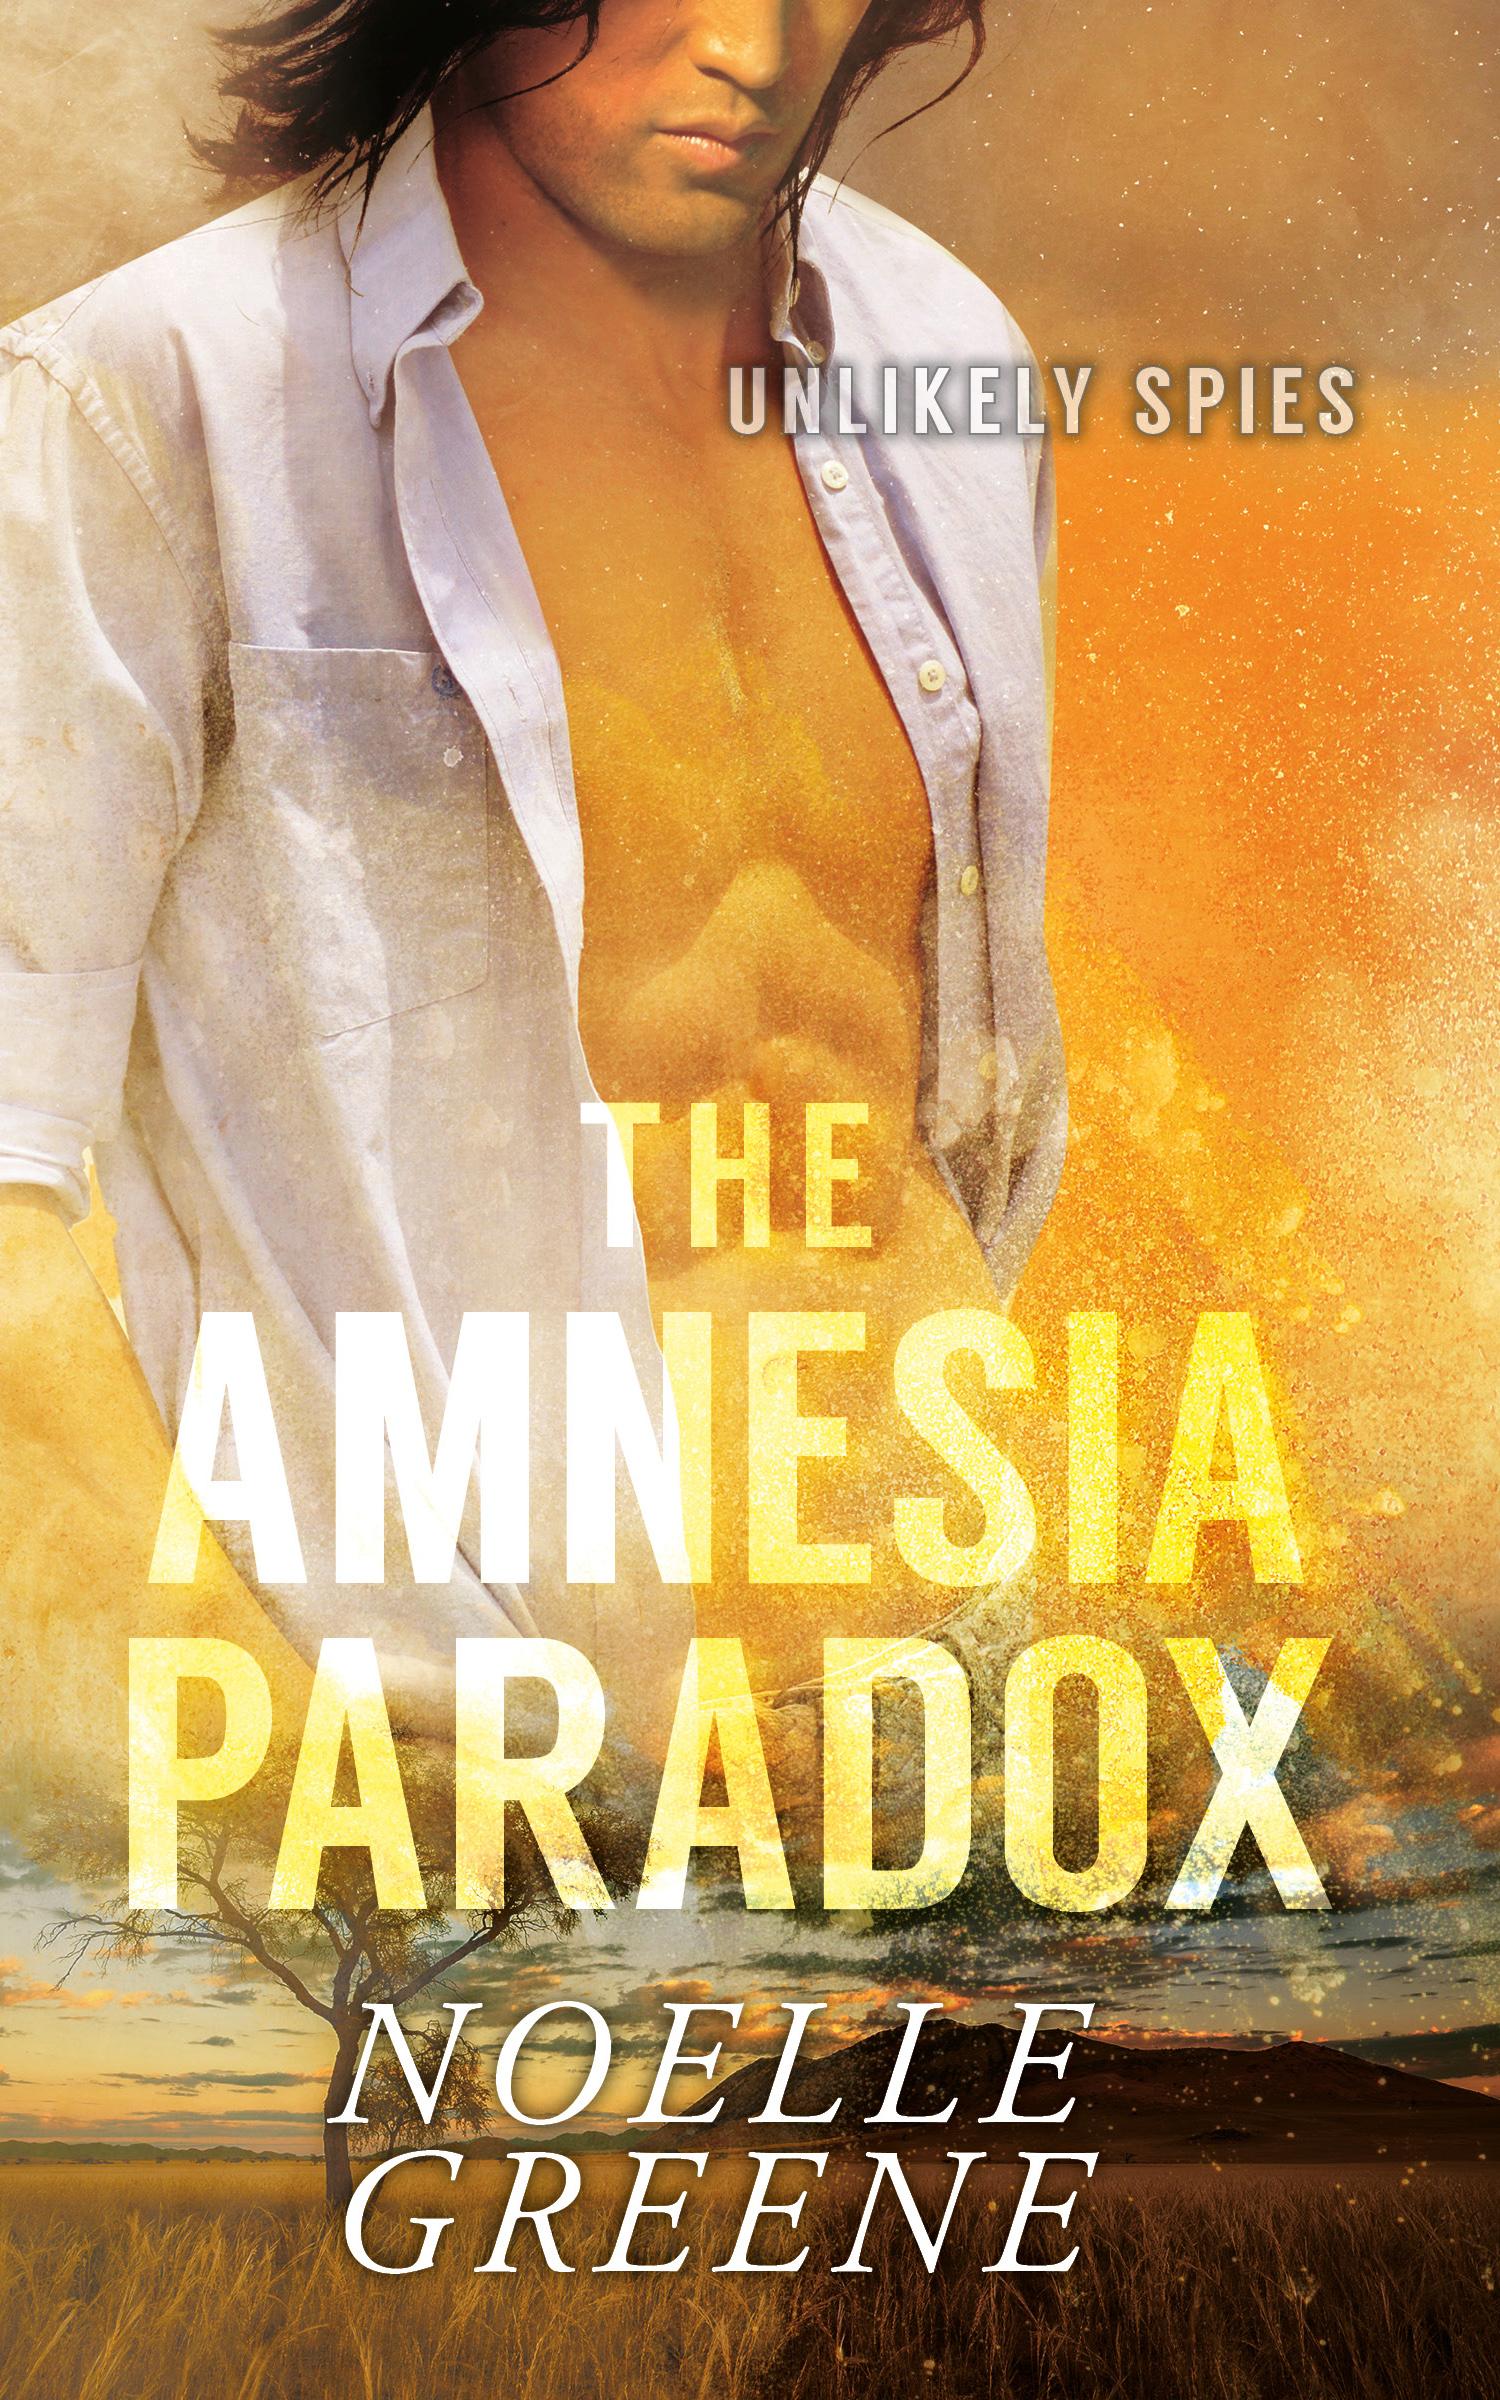 amnesia-paradox-cover